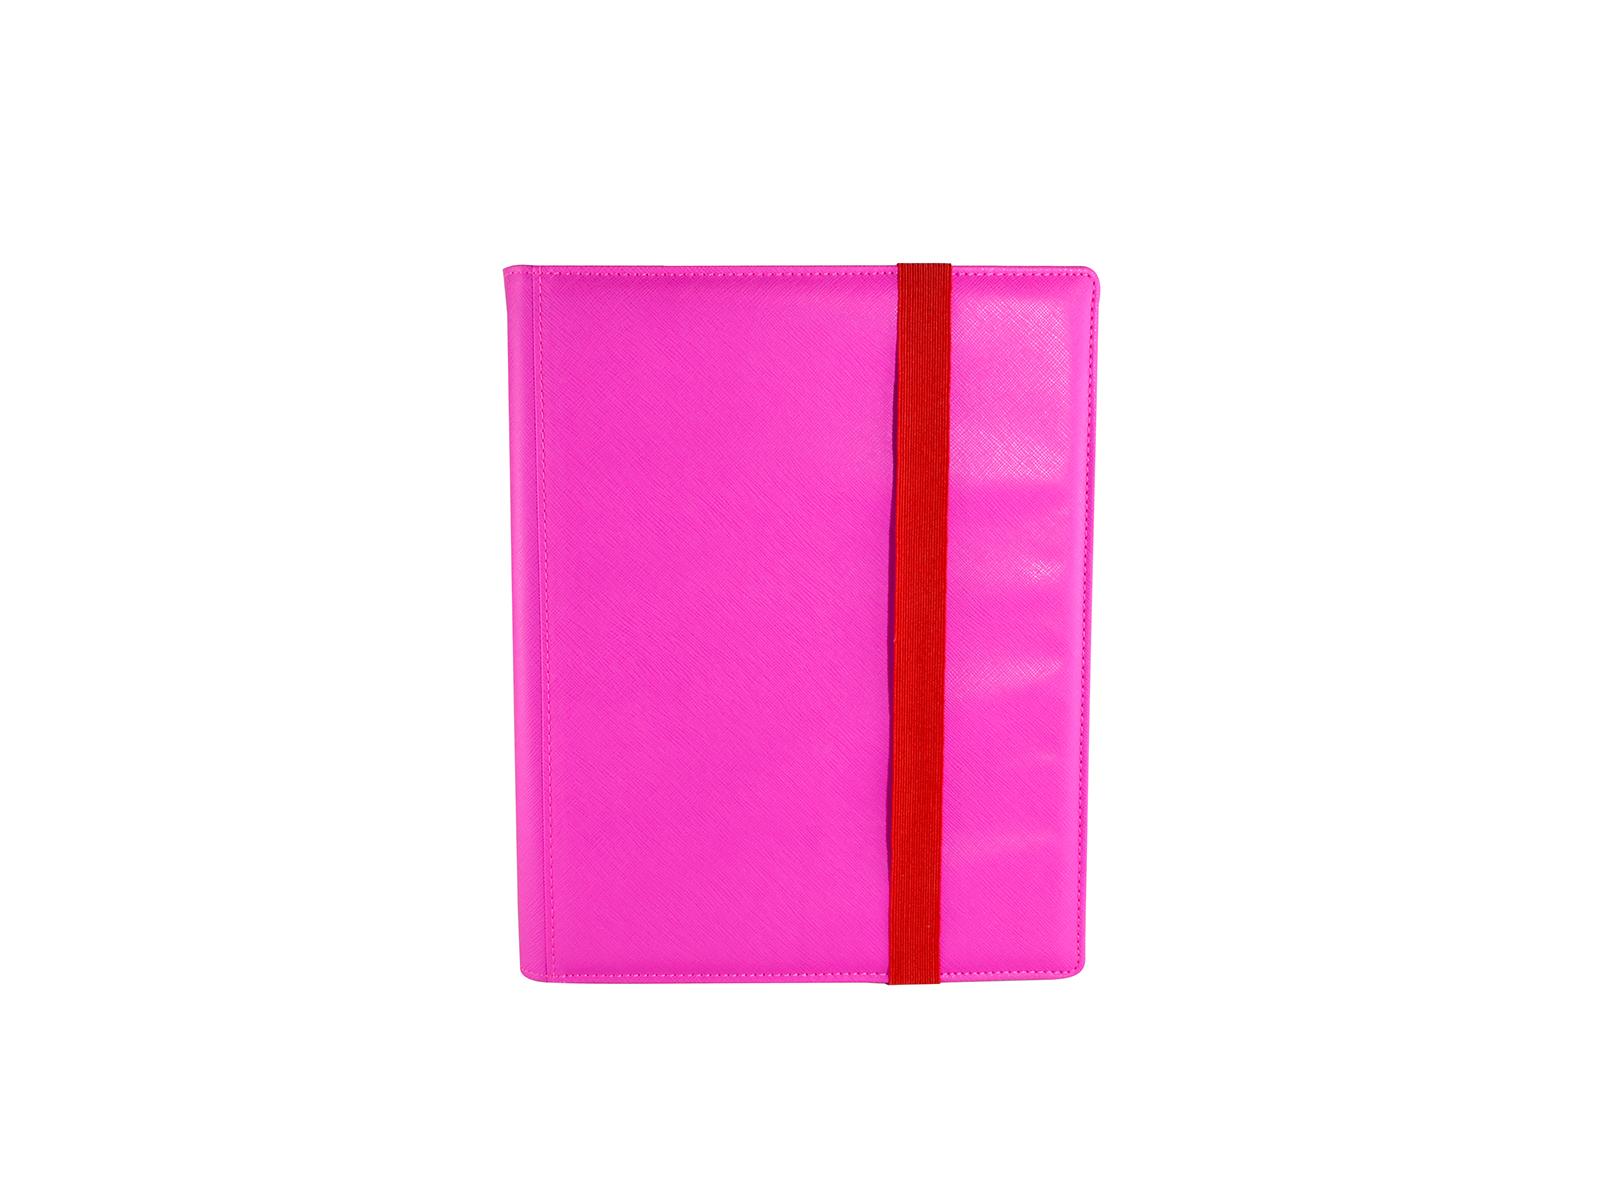 The Dex Binder 9 - Pink